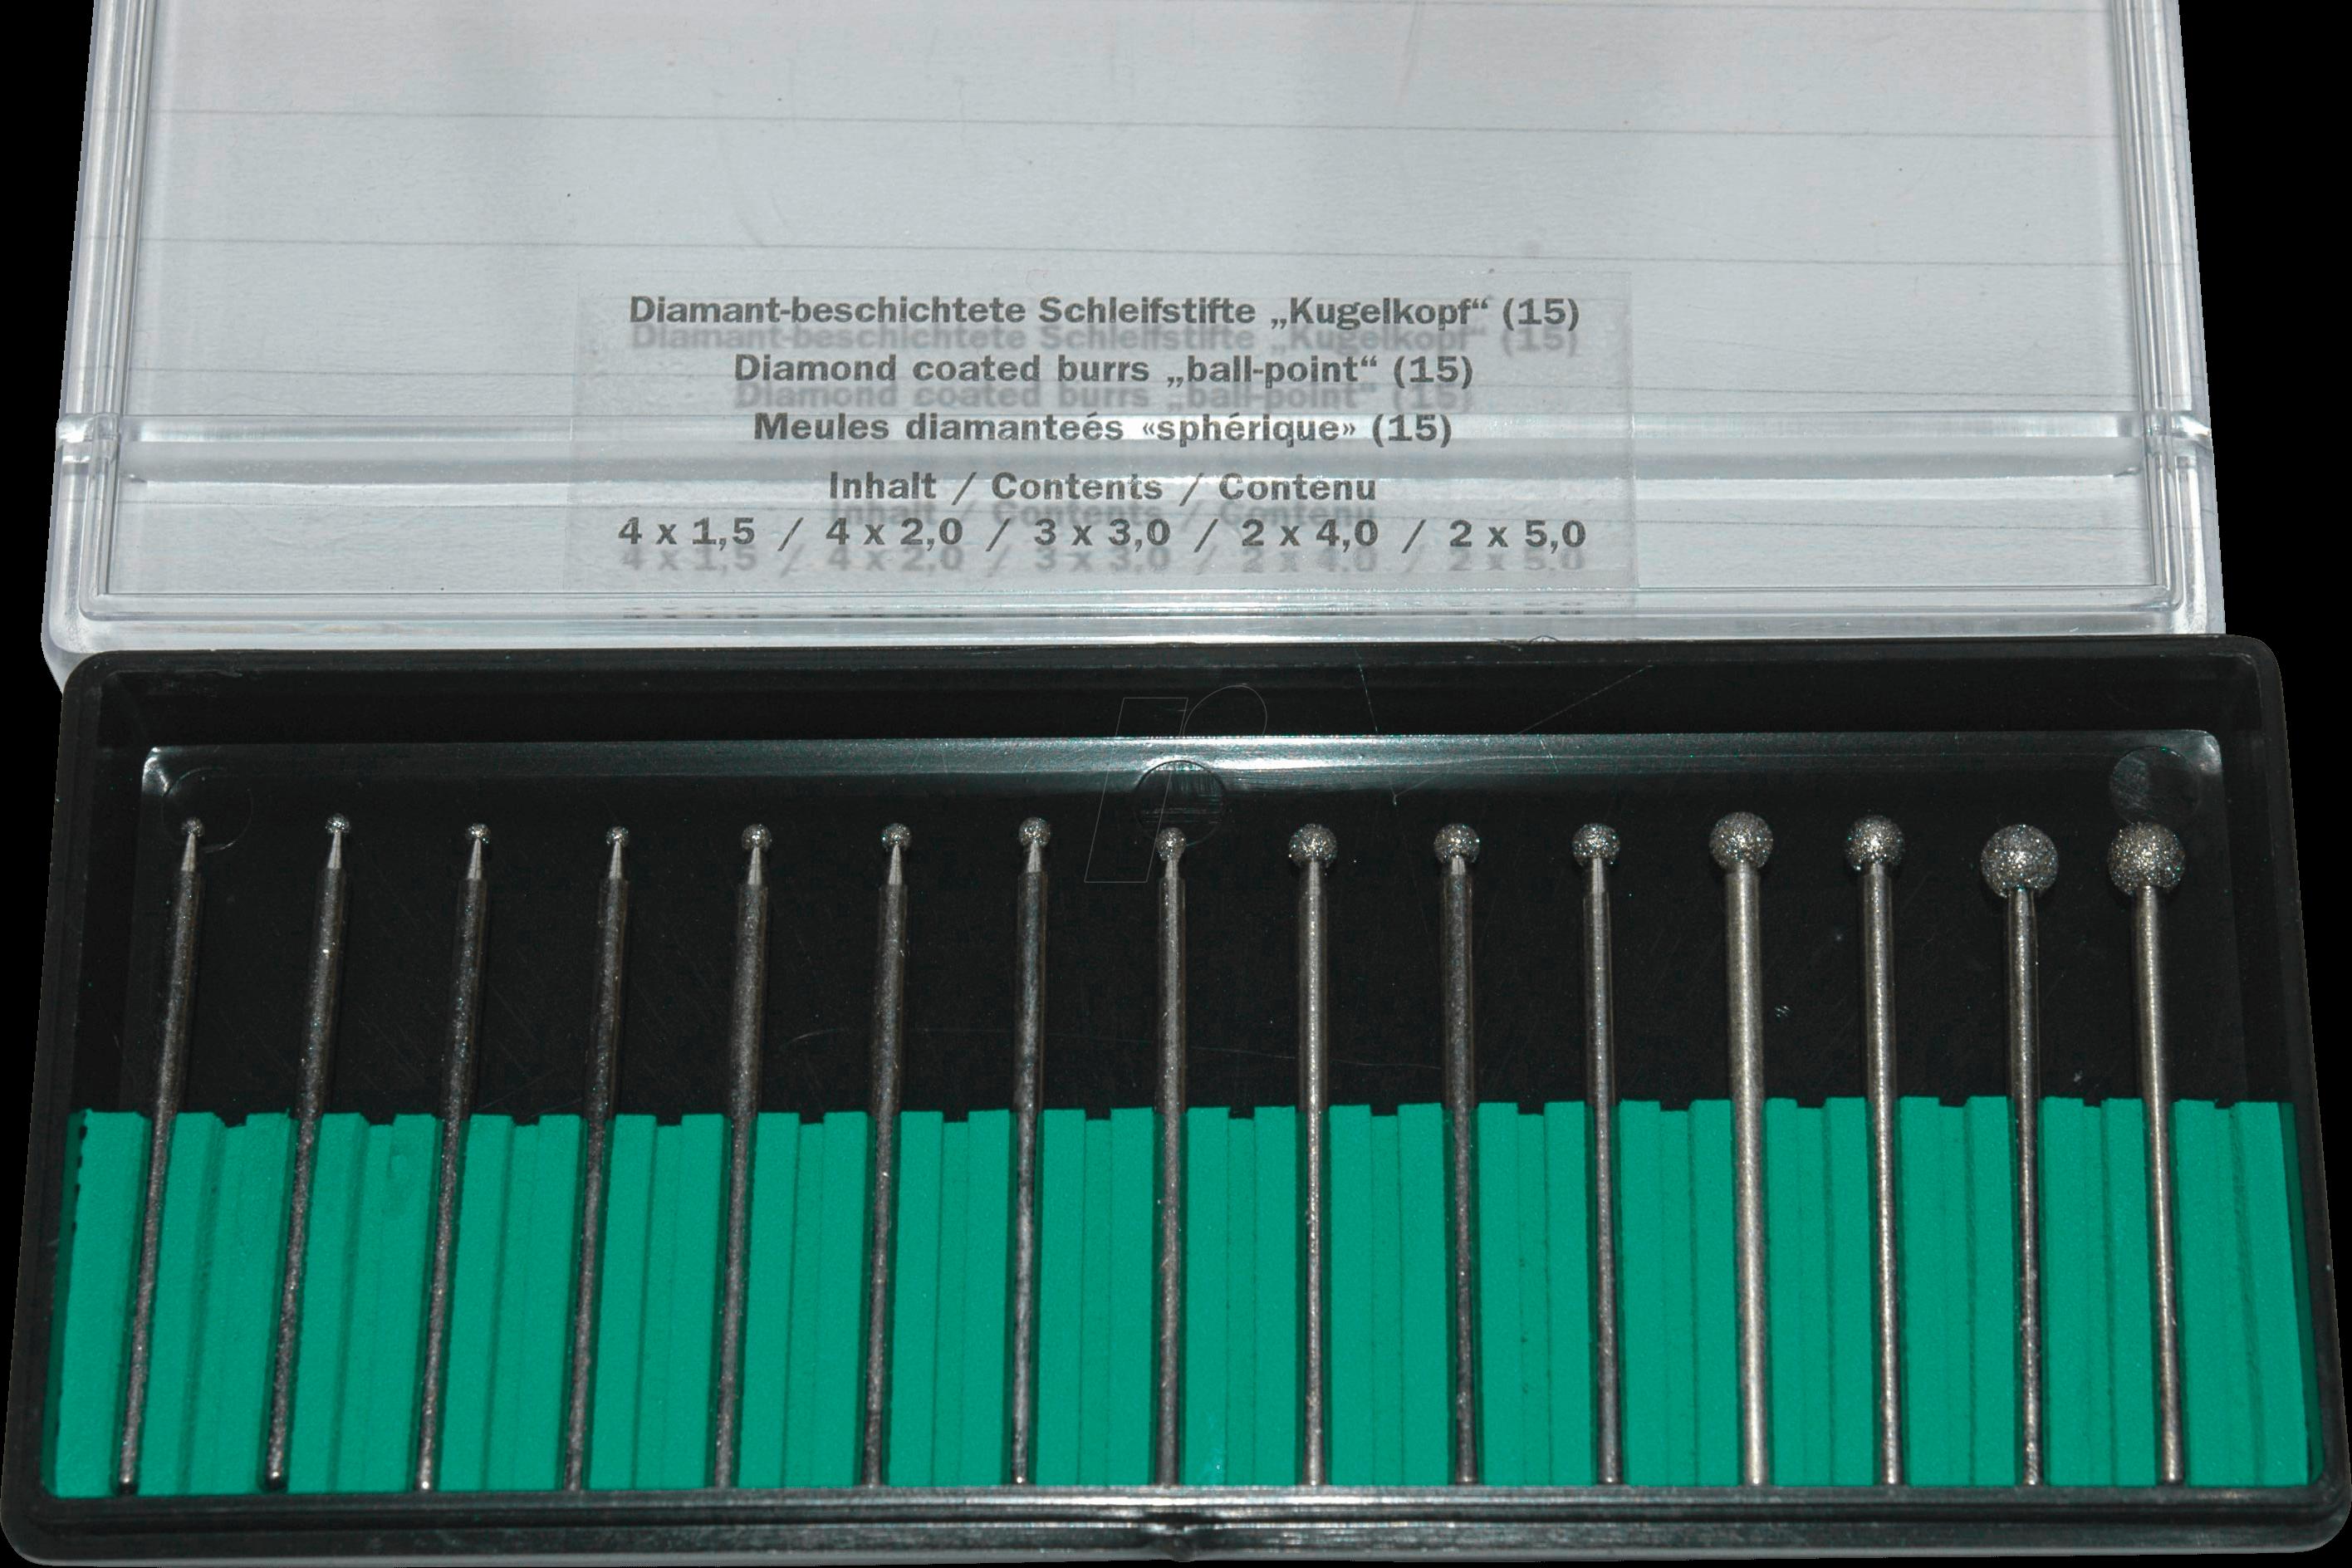 RONA 082894 - Grinding pen set, diamond, ball, 15-piece